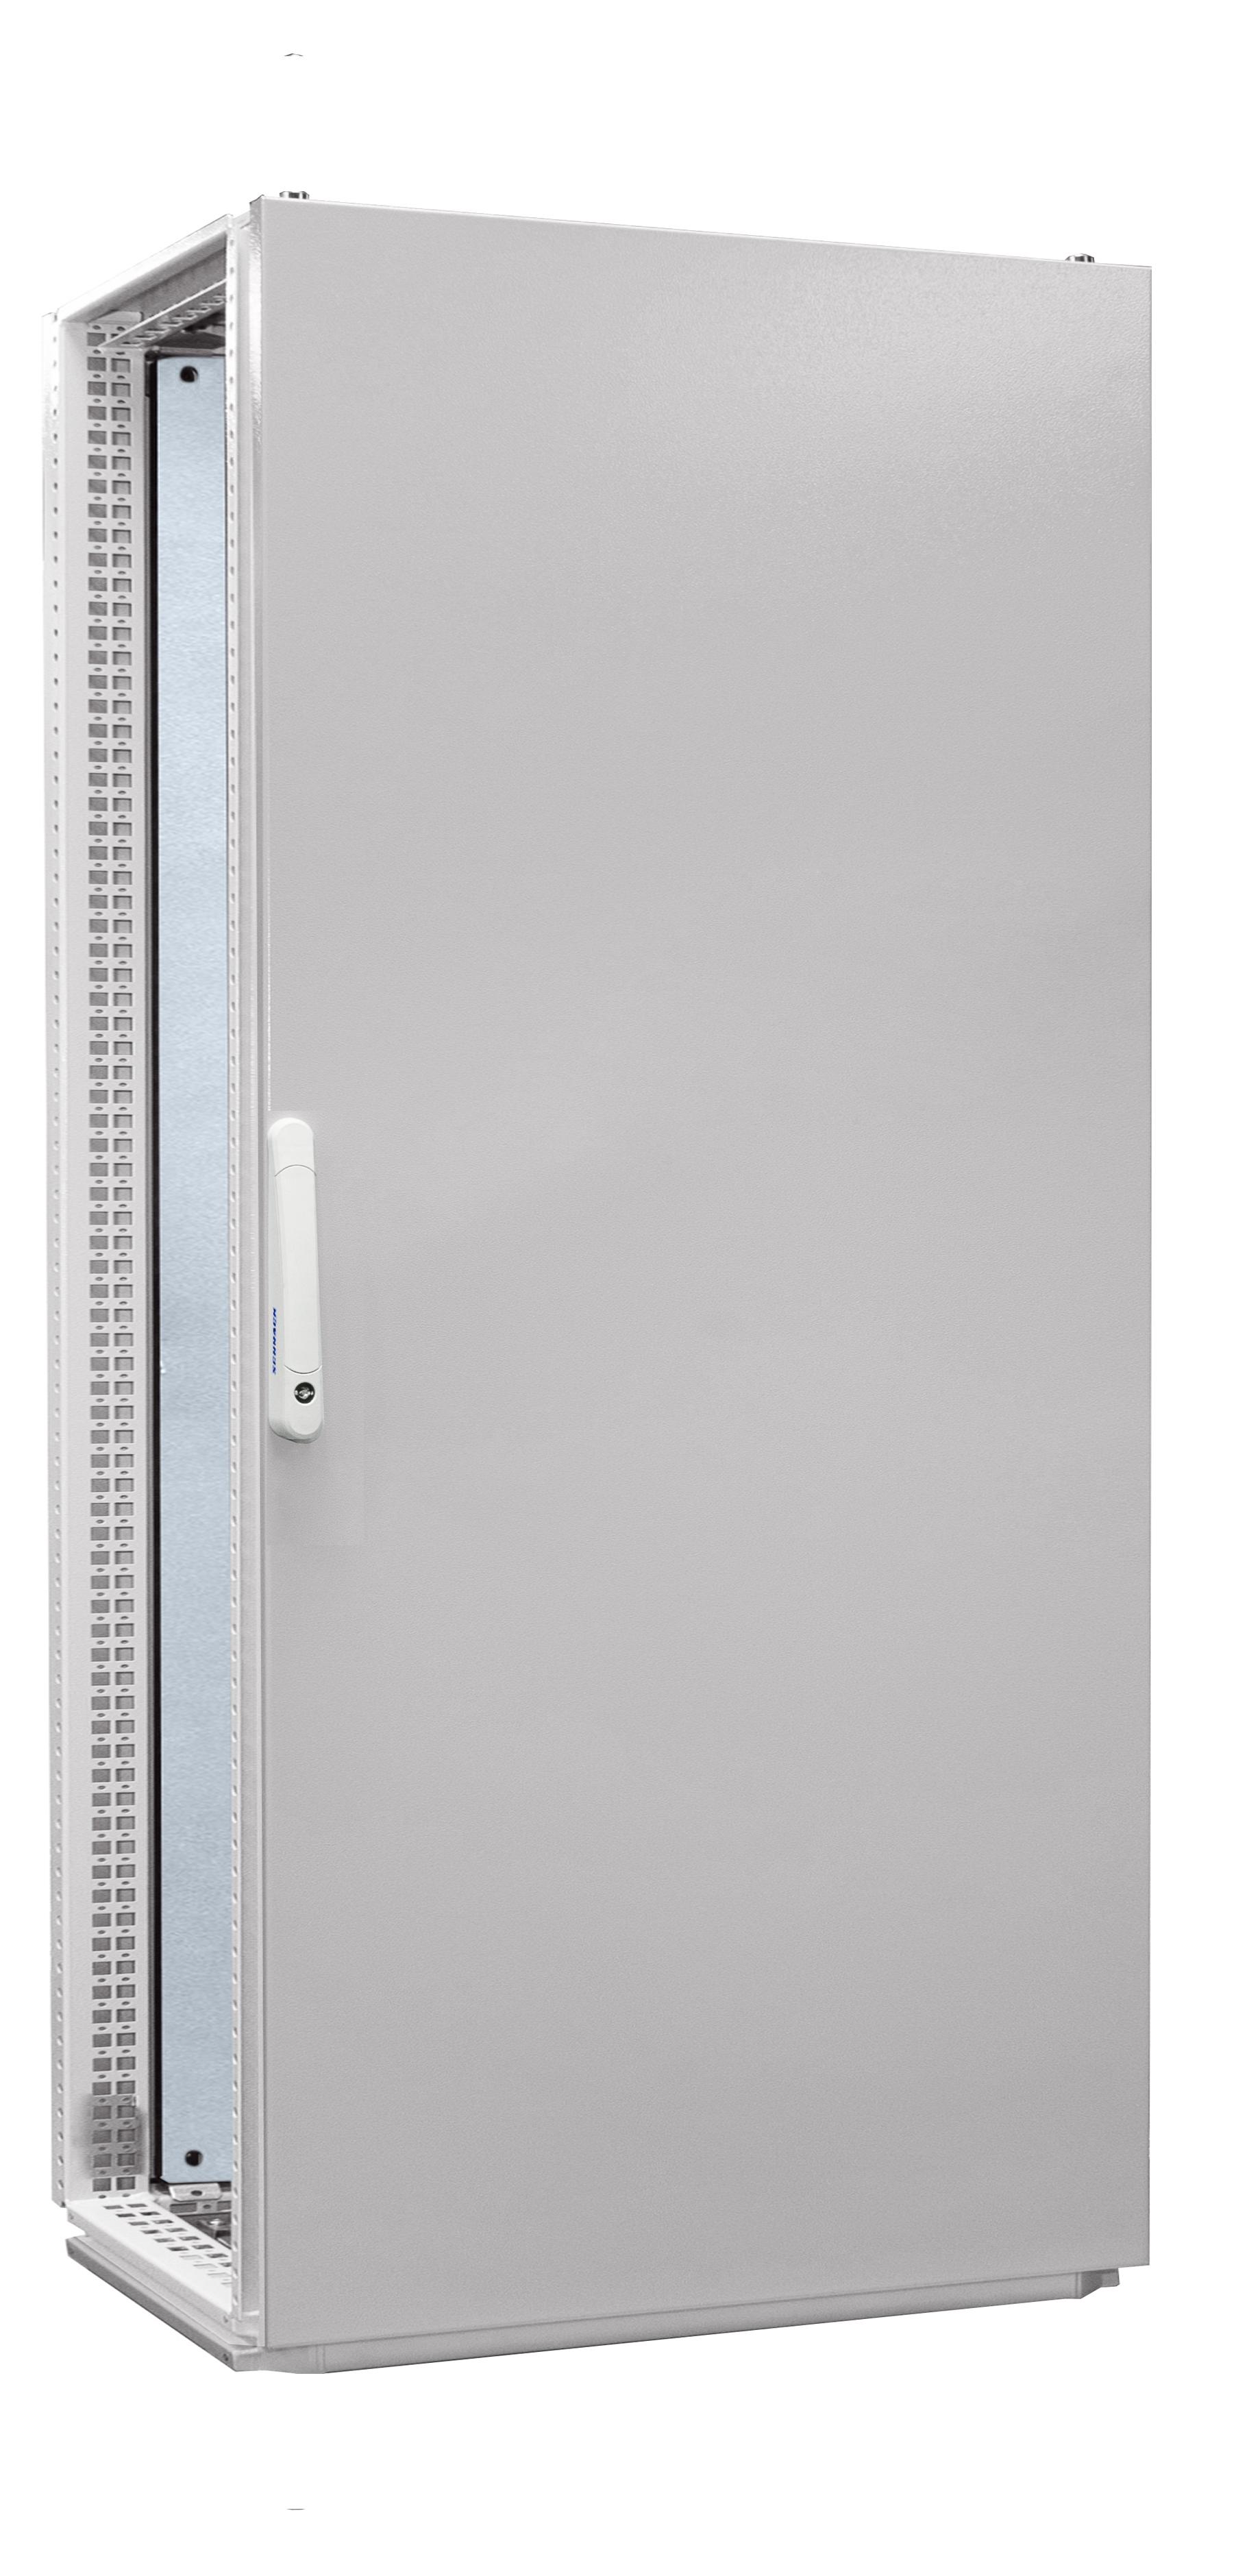 1 Stk Anreihschrank 1-Tür IP55 H=1800 B=800 T=600mm Stahlblech AC188060--